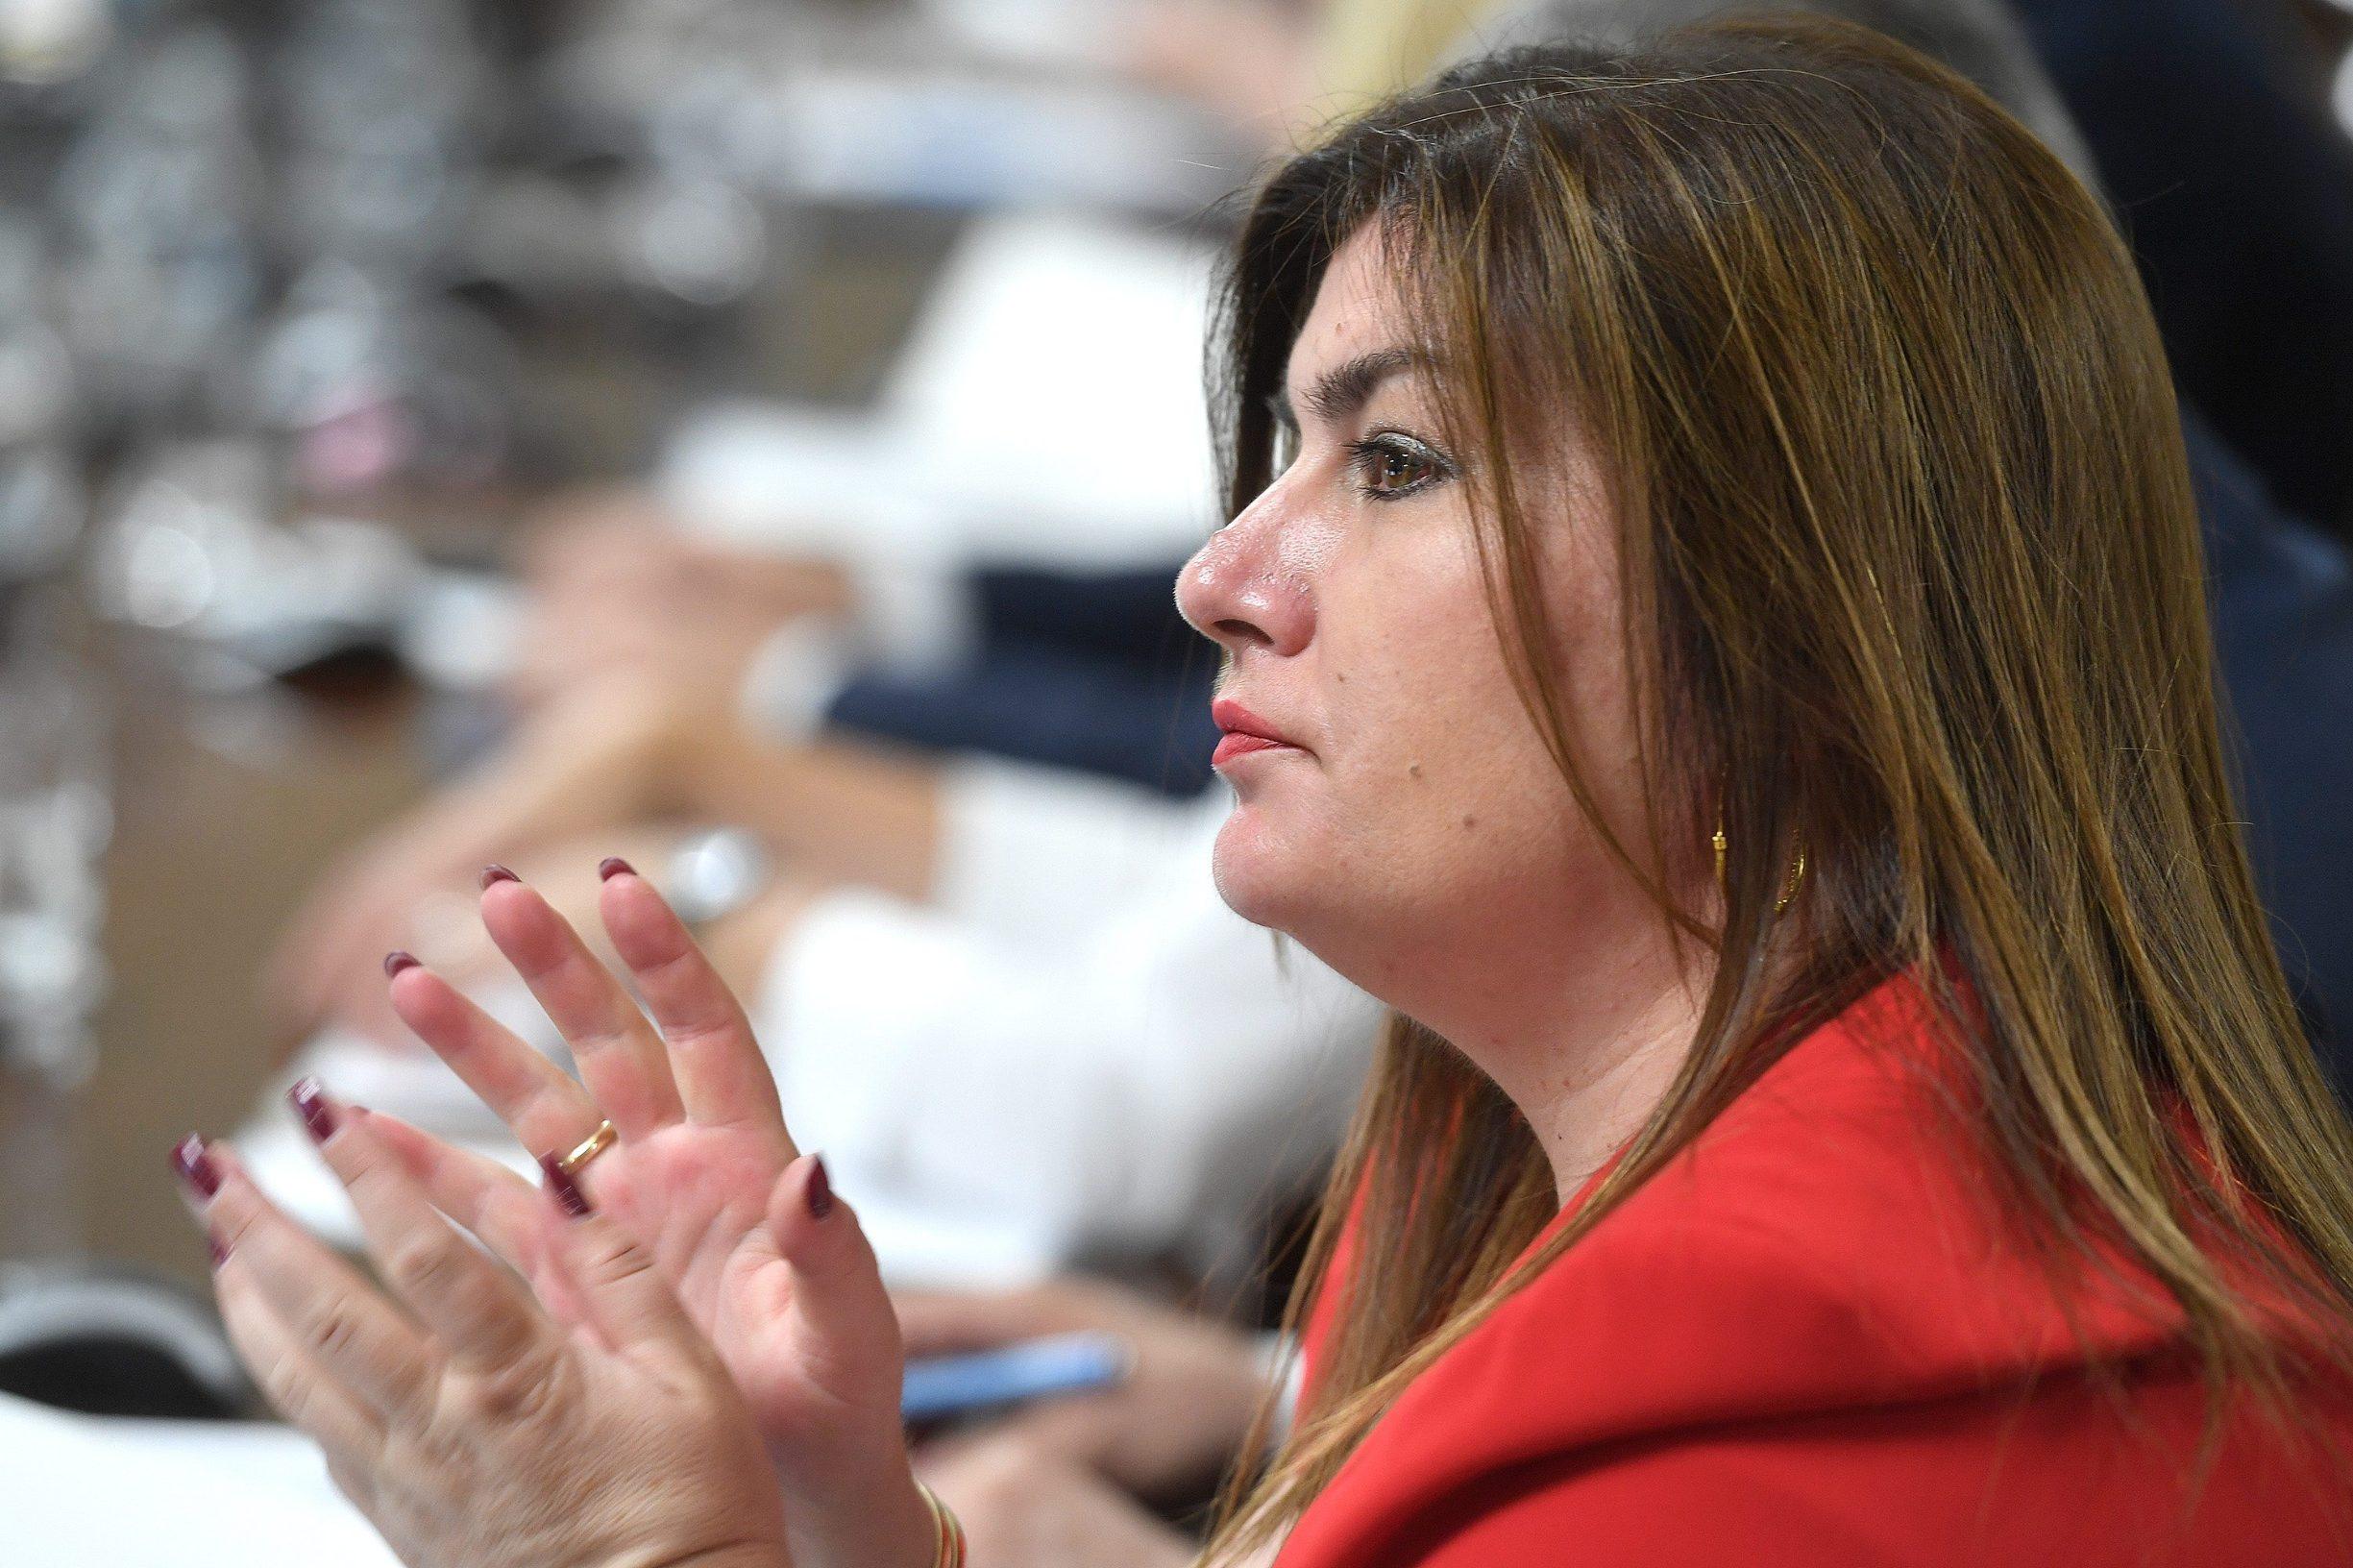 Gabrijela Zalac, Minister of Regional Development and EU Funds